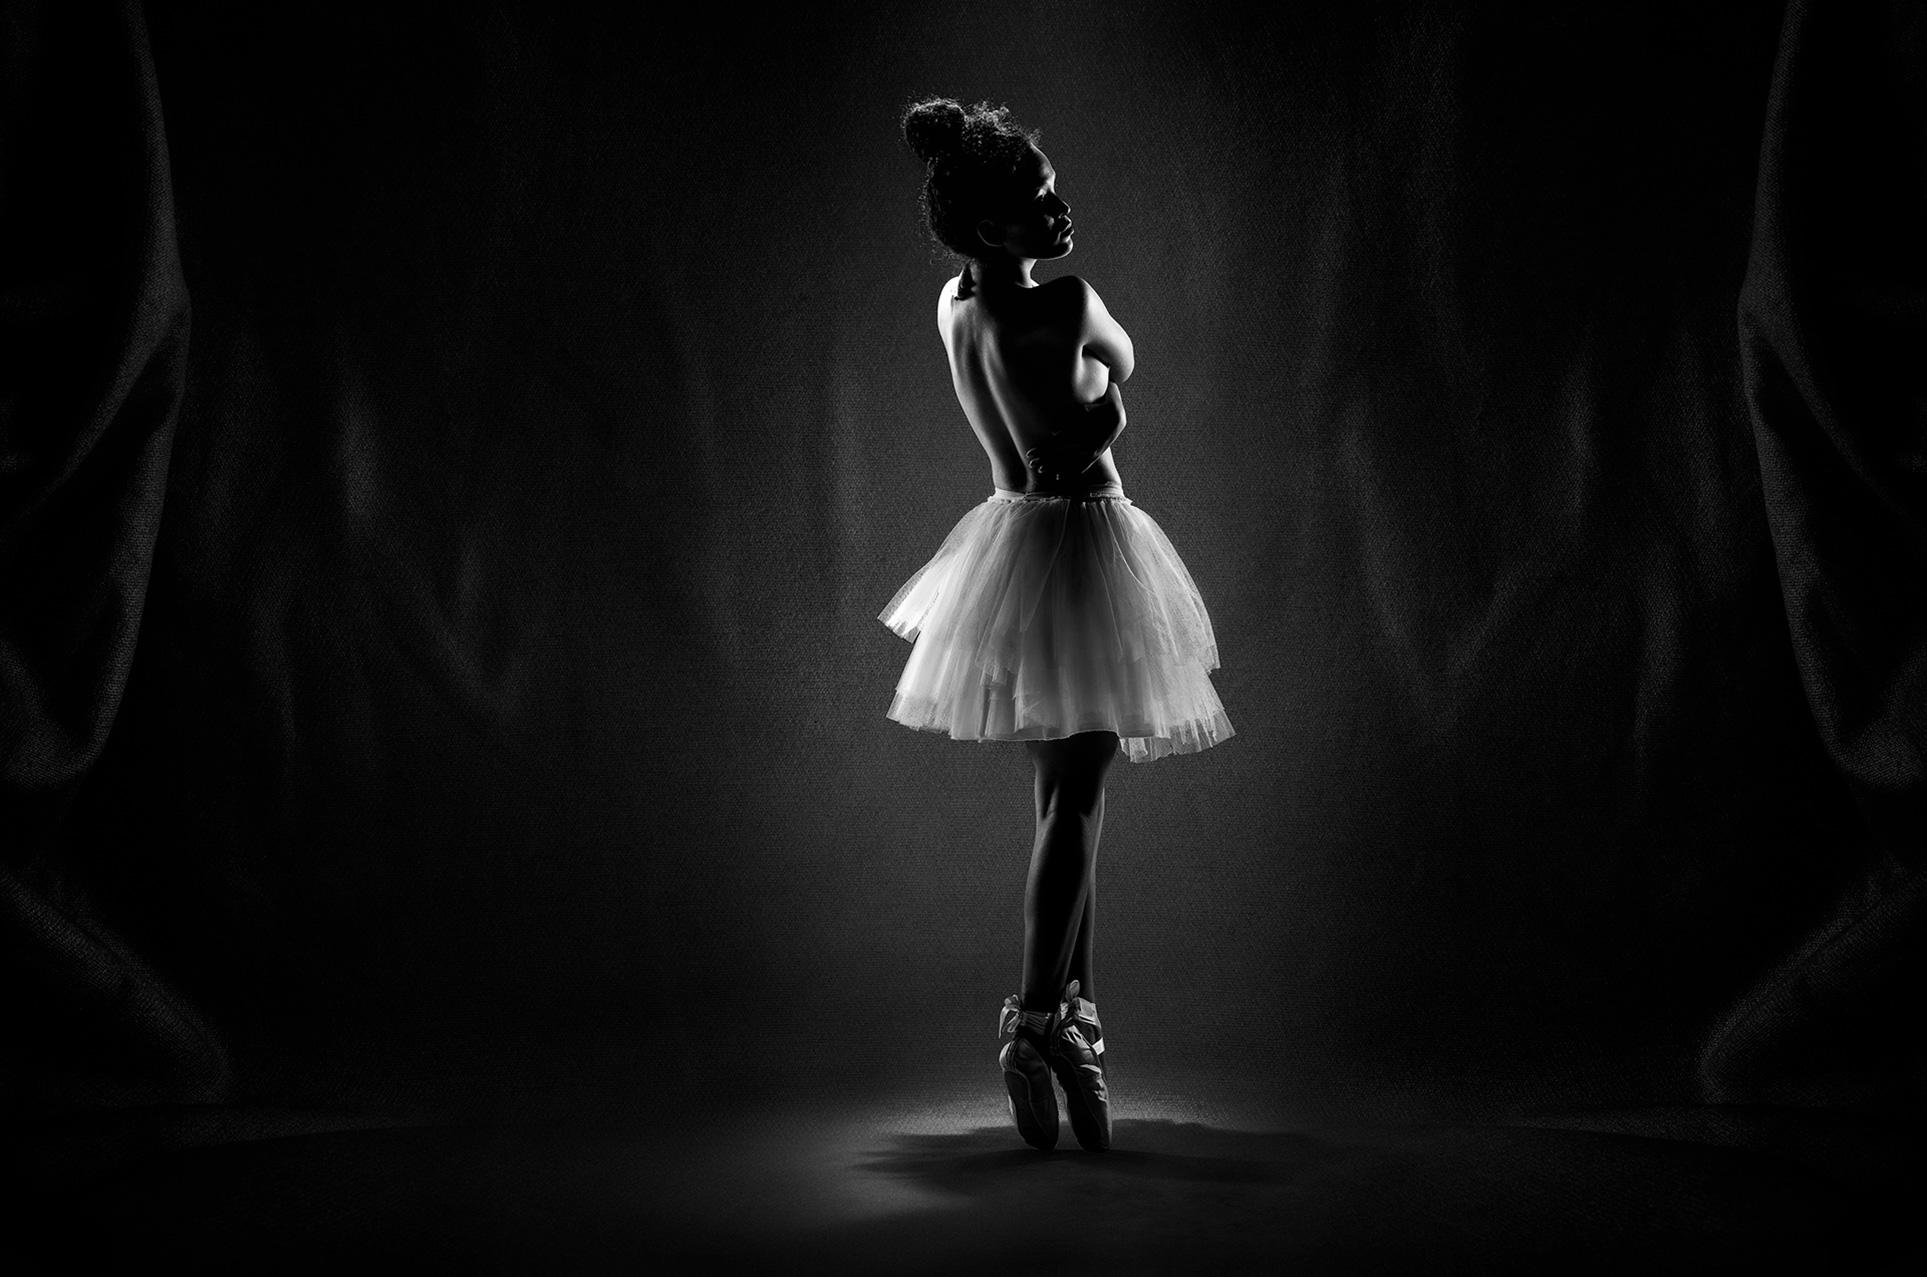 Jafra Araujo, Emanuelly Souza, Juliette Gouveia - La Ballerine by Jackson Carvalho